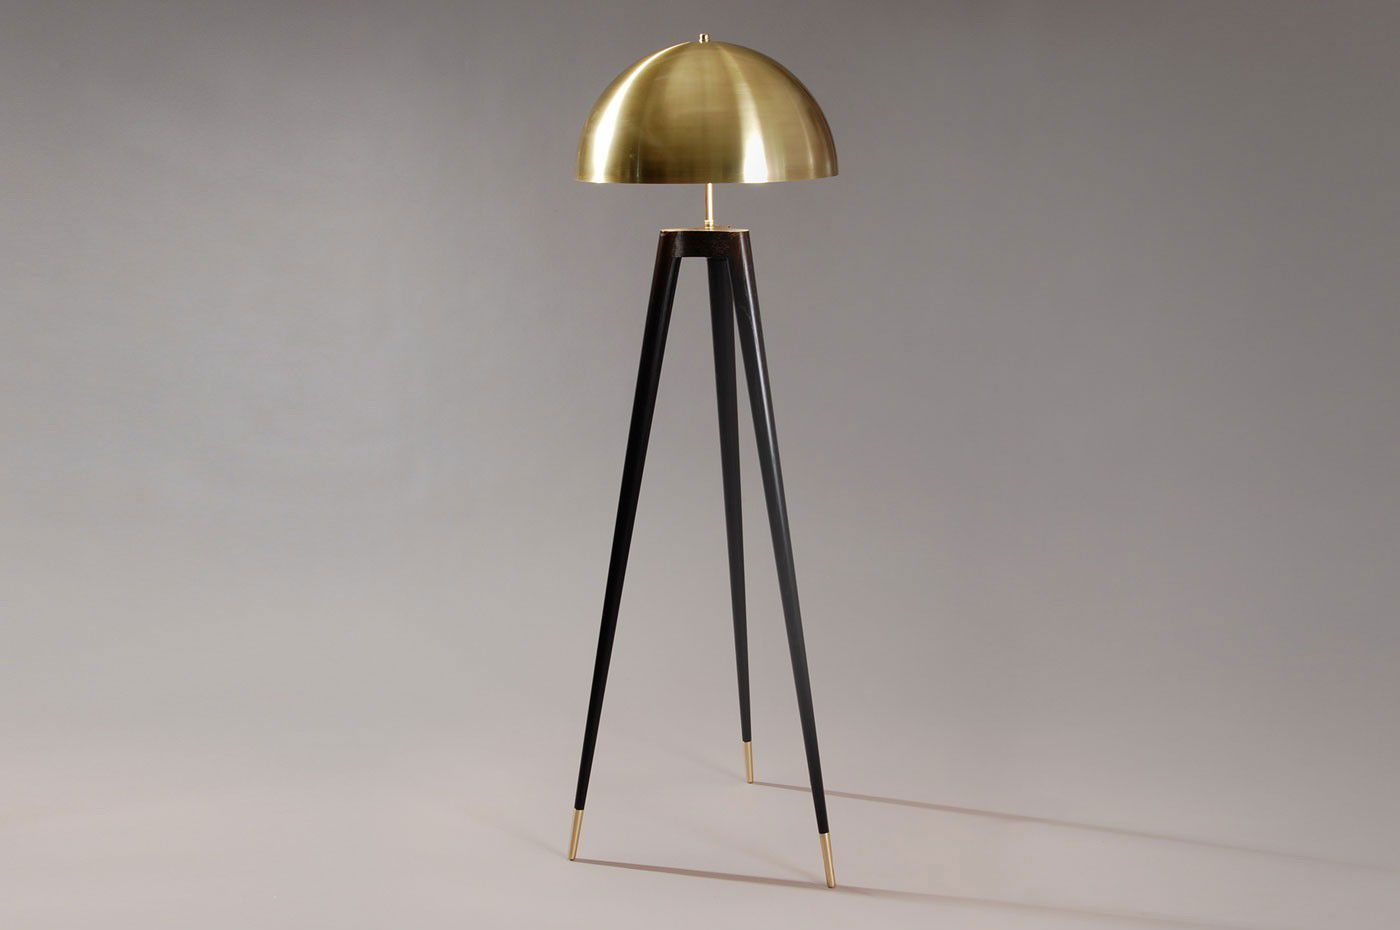 Surveyors Floor Lamp - 8 super chic modern floor lamps